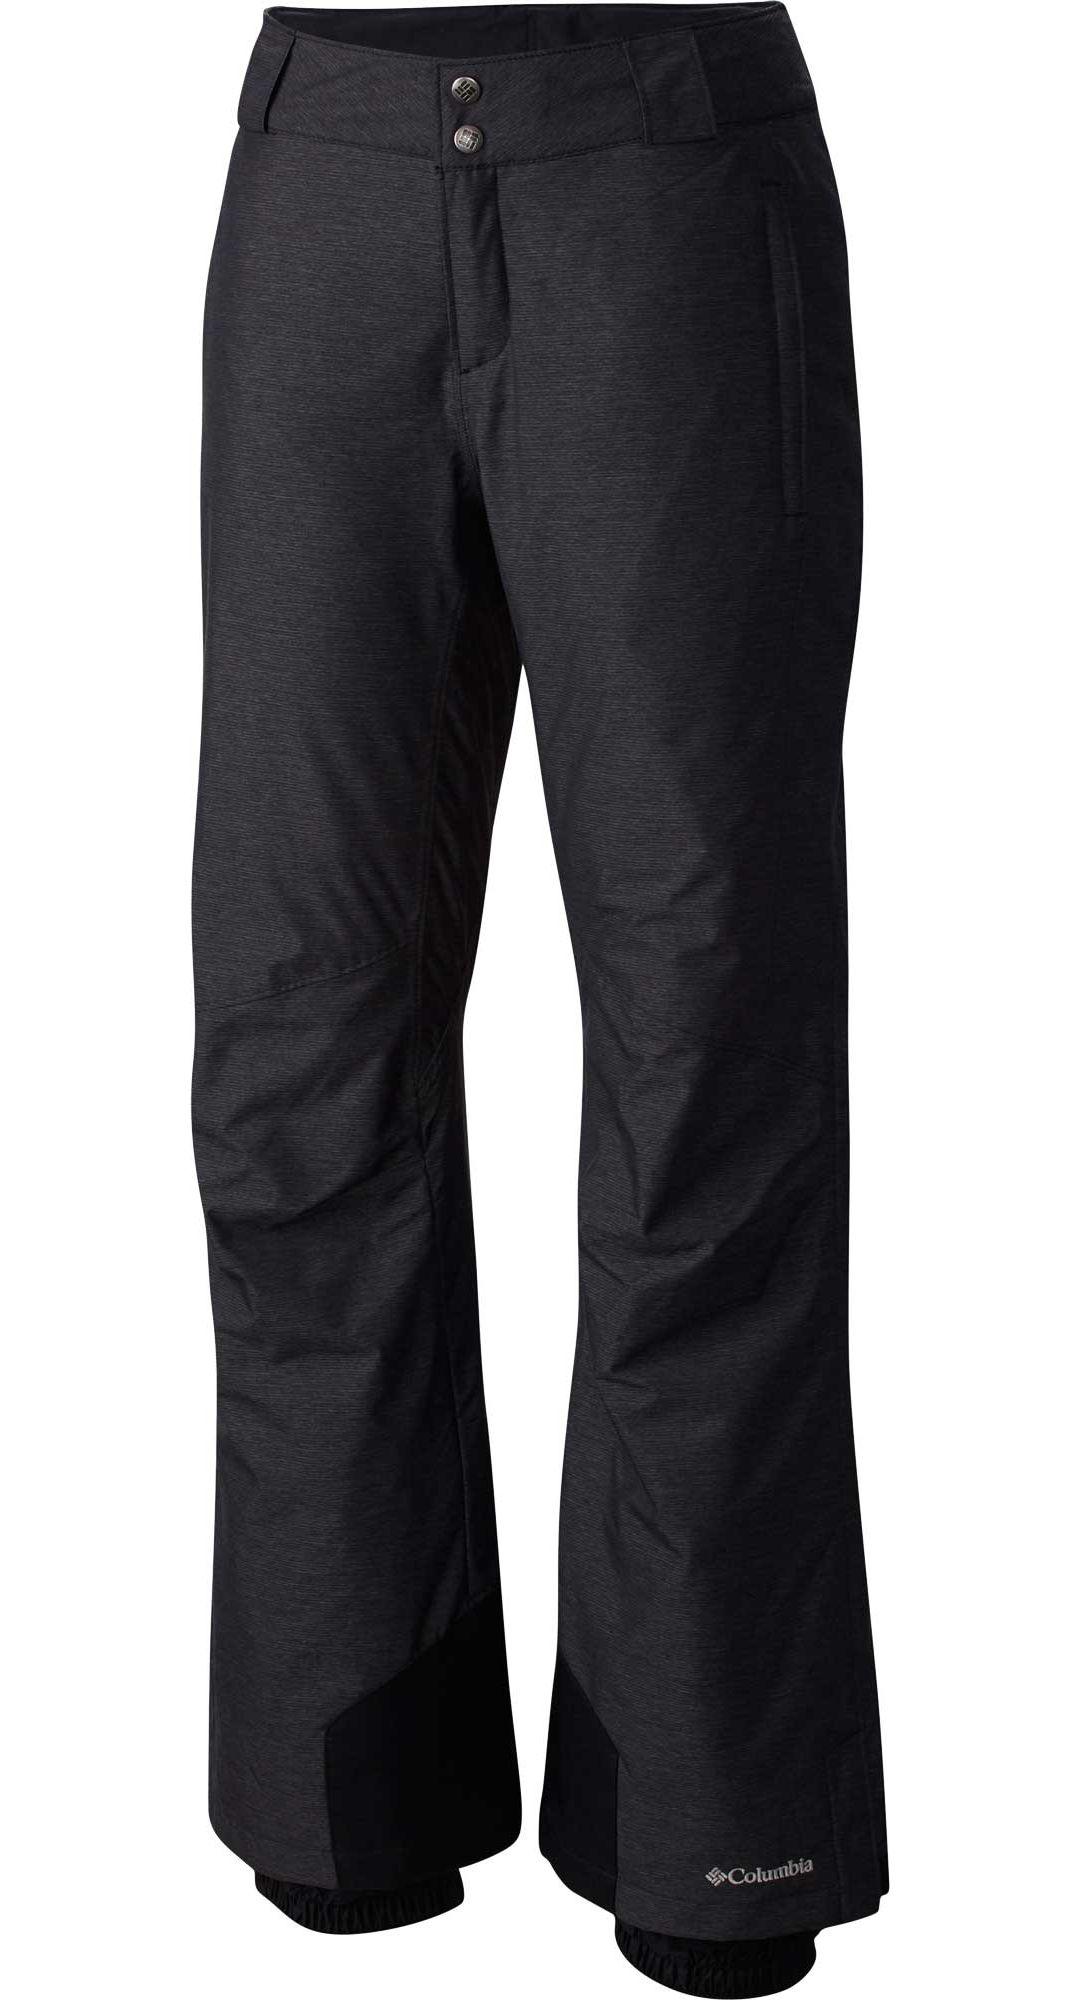 e4464cbf128e4 Columbia Women's Bugaboo Omni-Heat Insulated Snow Pants. noImageFound.  Previous